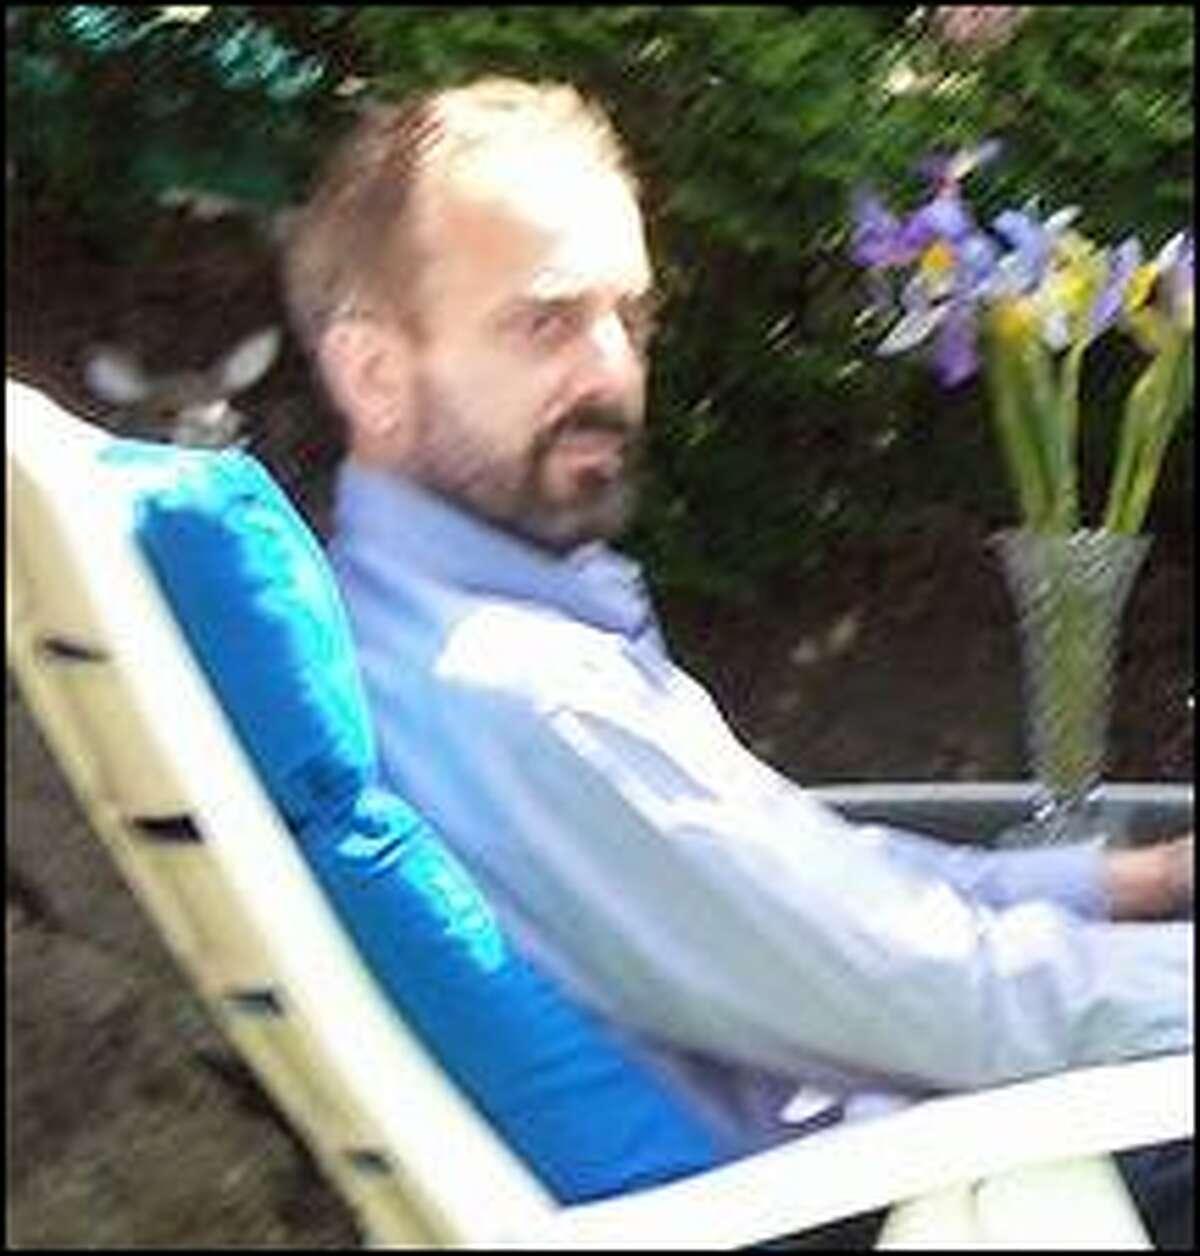 James Paroline died in July after a punch.